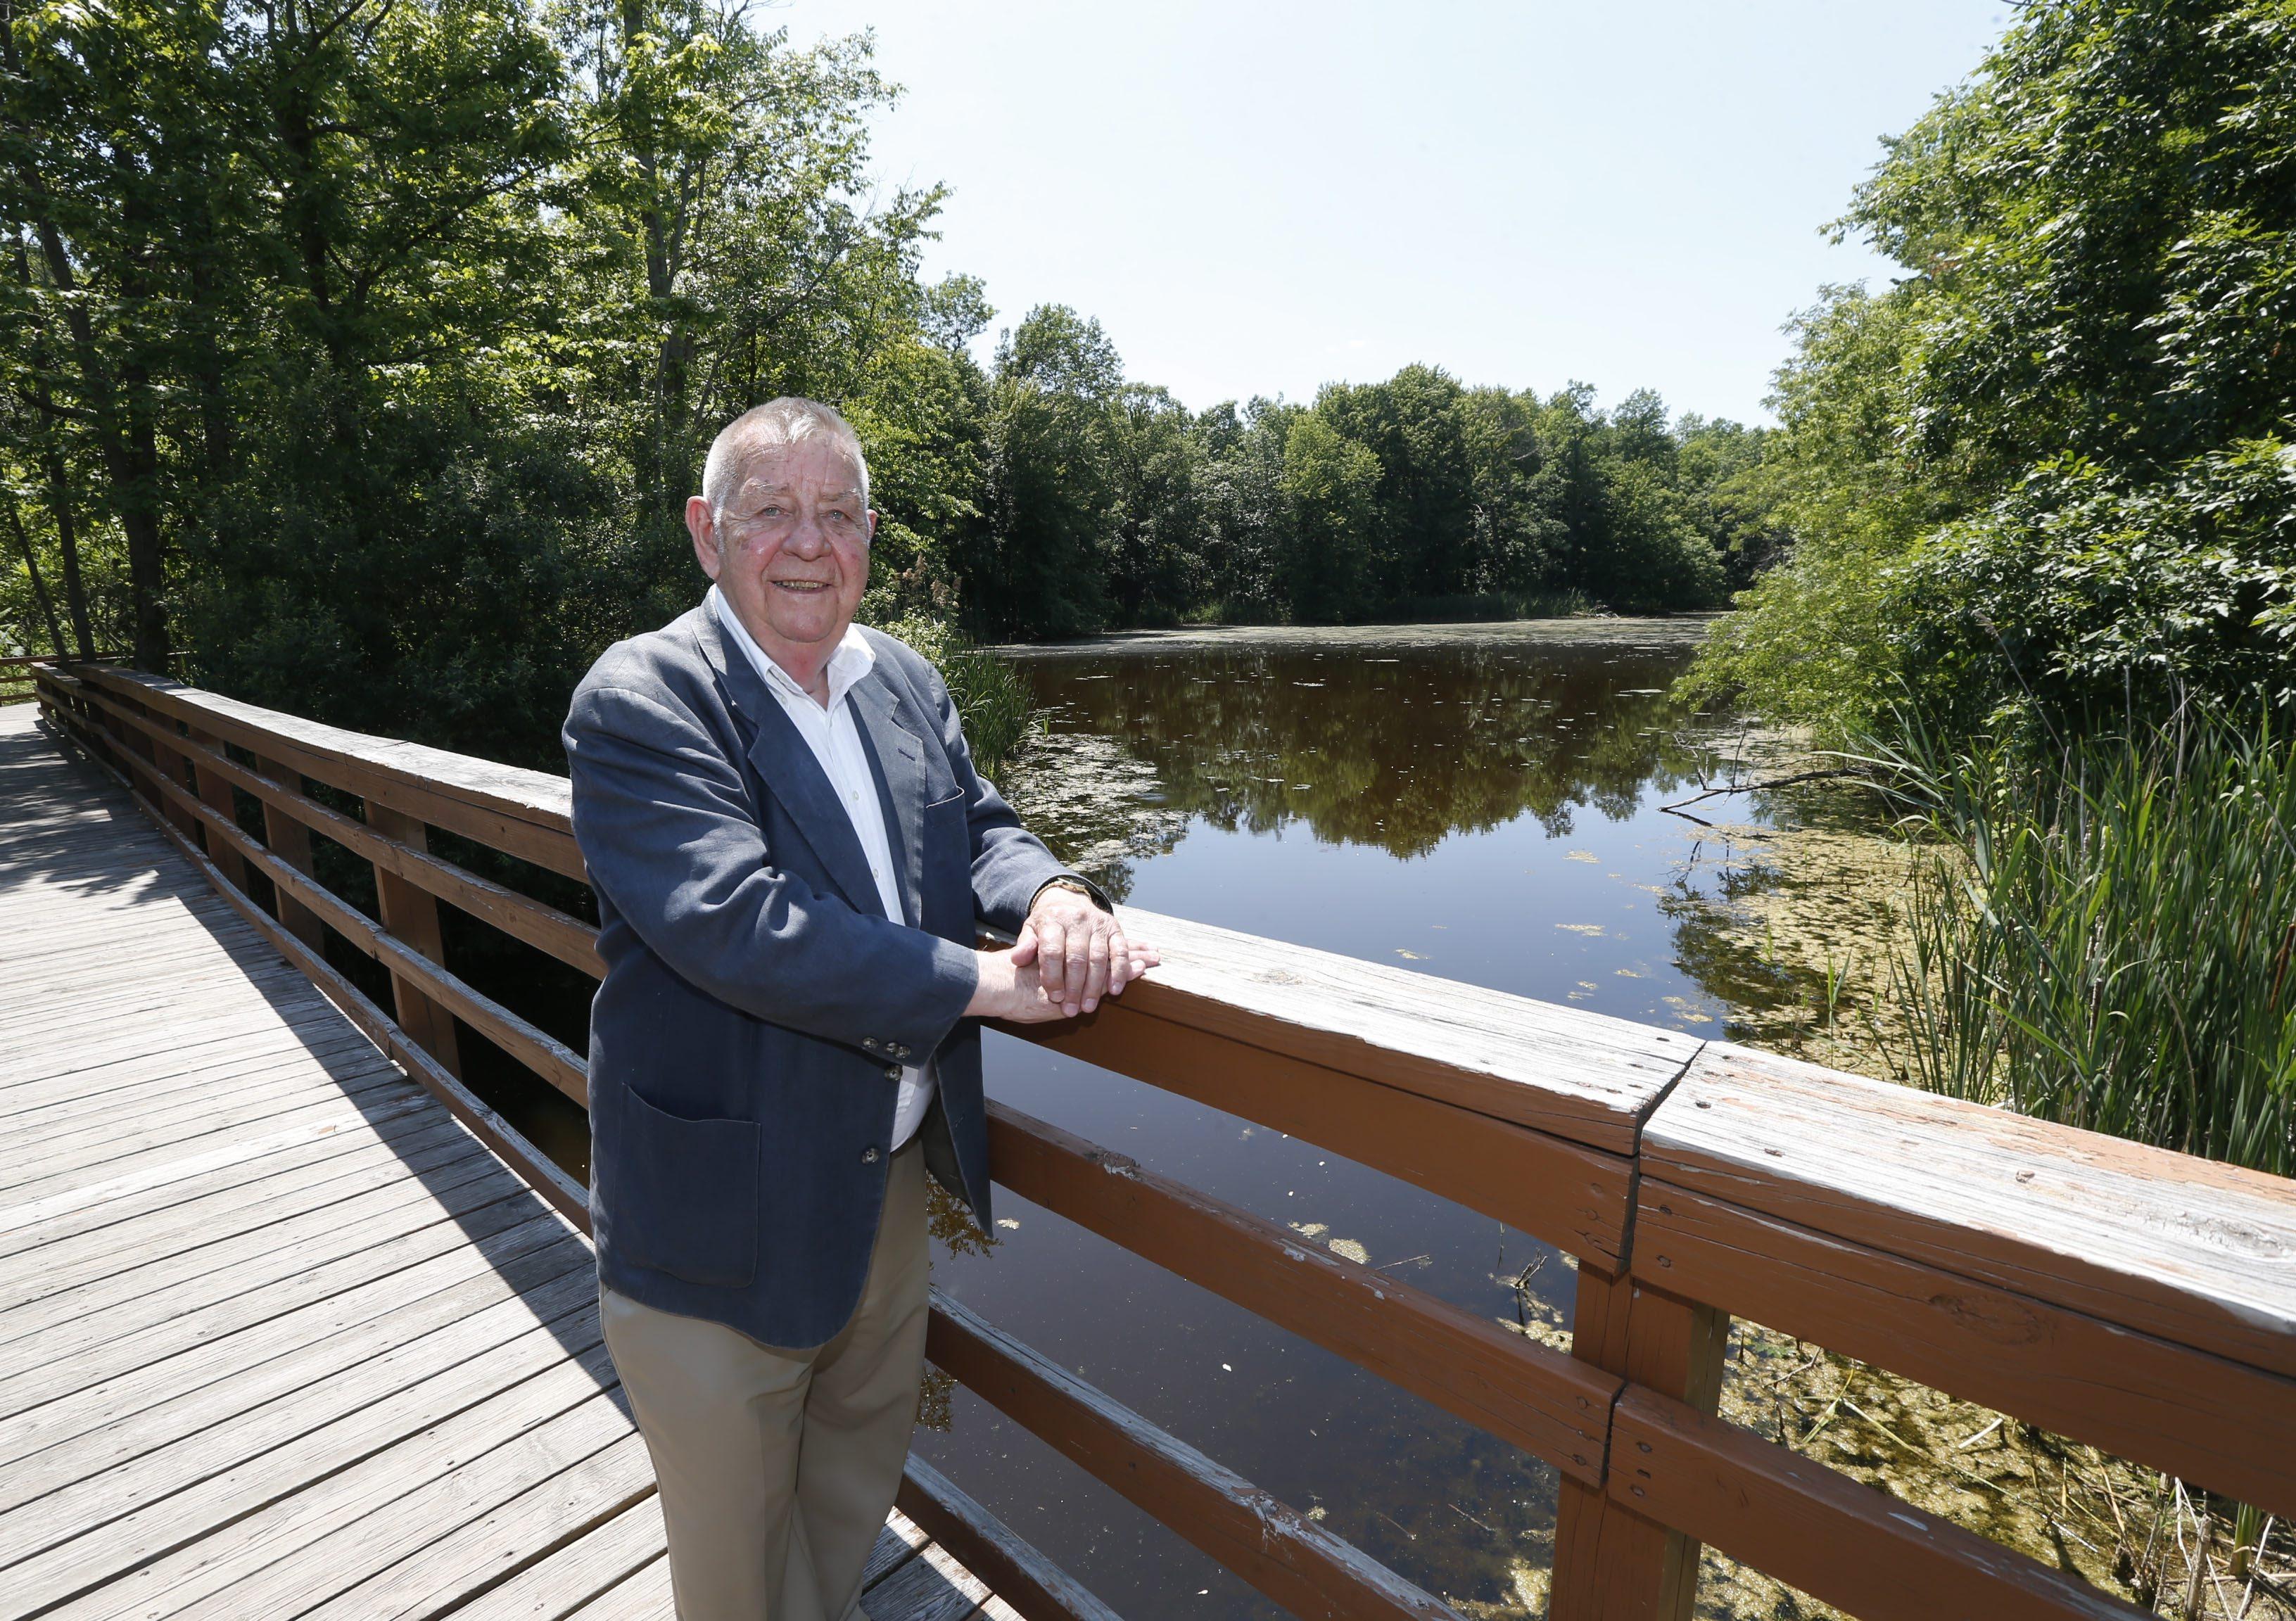 Former Amherst Town Board Member Bill Kindel stands on a foot bridge at Billy Wilson Park on Friday, June 24, 2016.  (Robert Kirkham/Buffalo News)